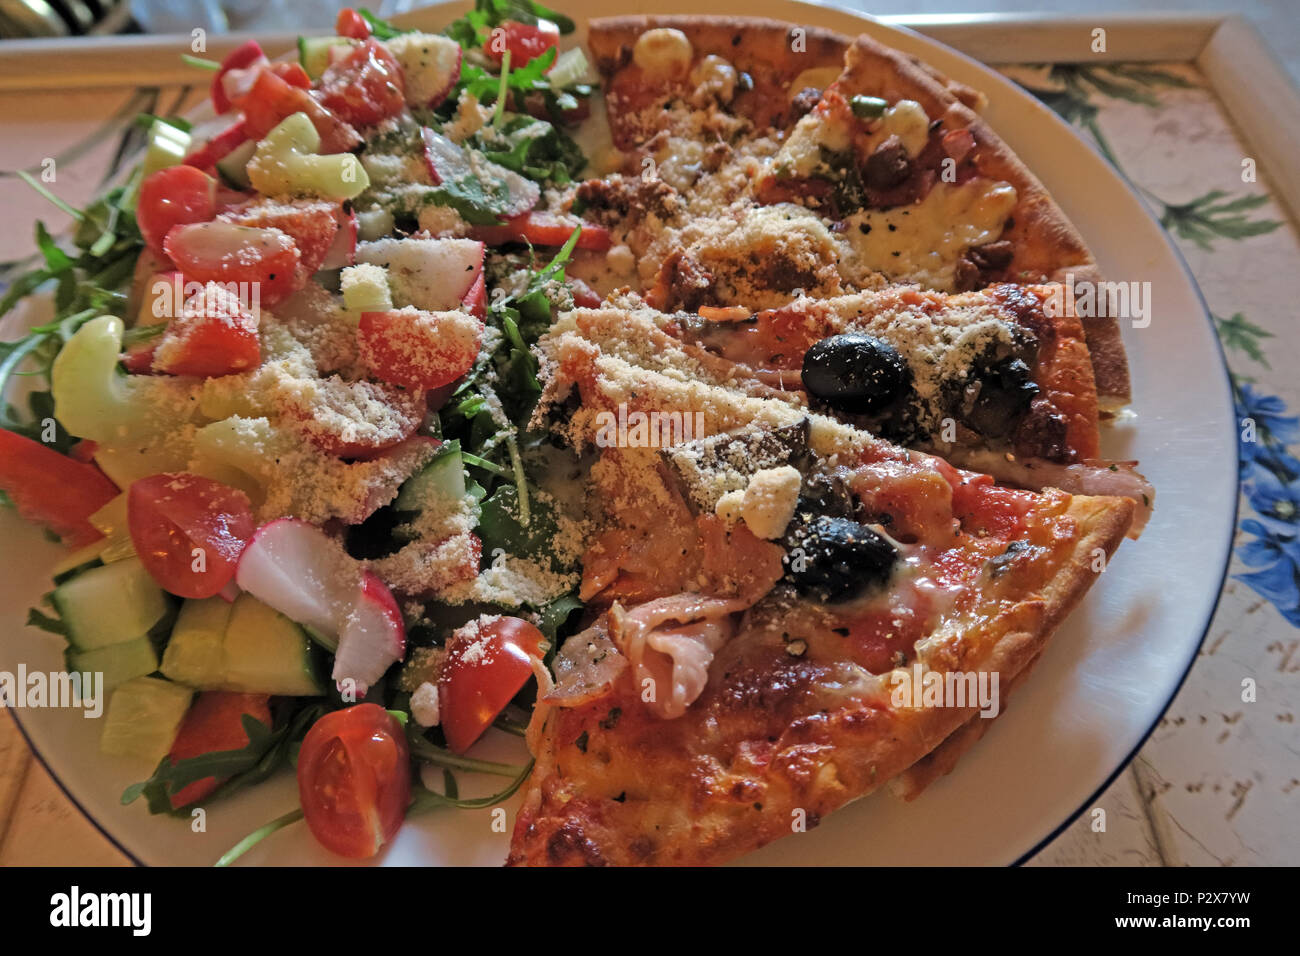 GoTonySmith,@HotpixUK,fat,fatty,slice,slices,plate,with